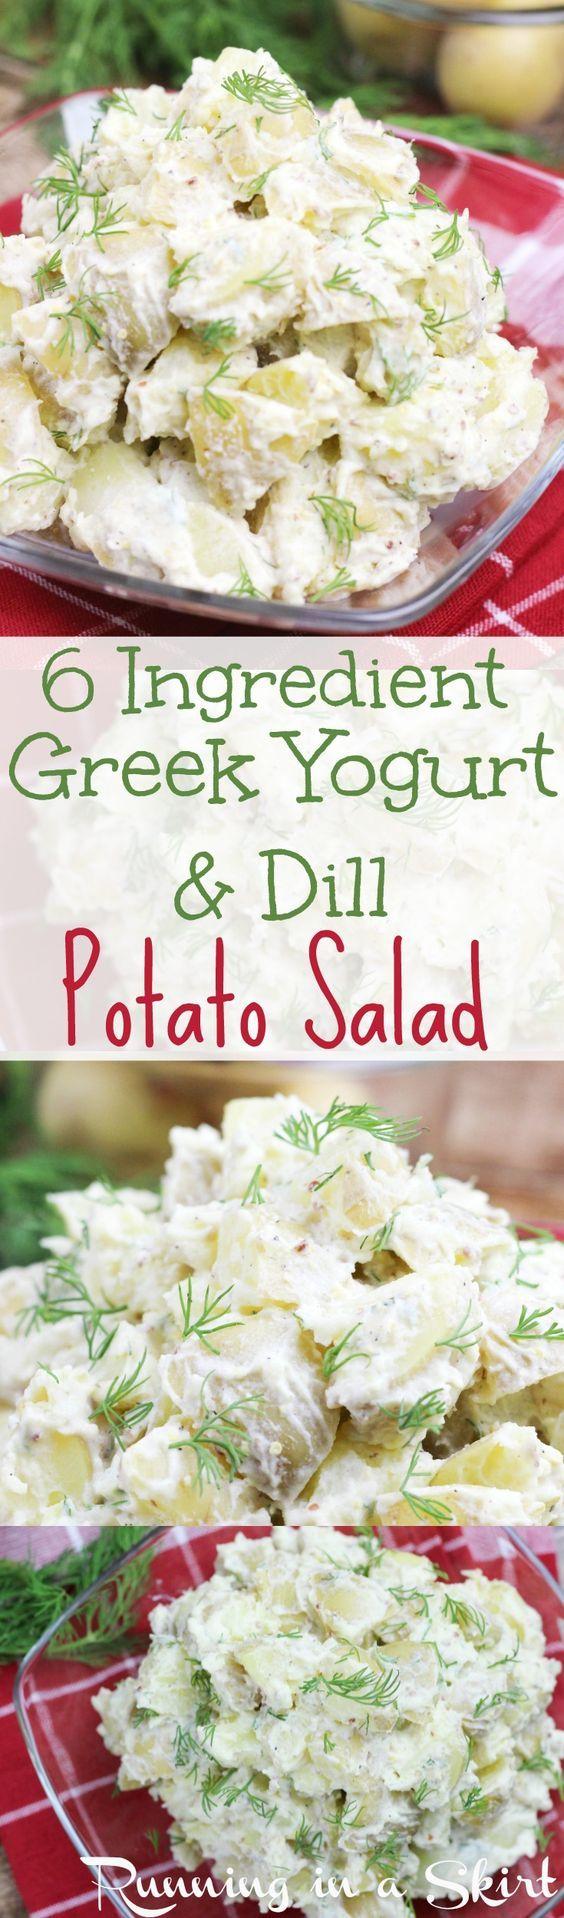 Greek Yogurt Potato Salad with Dill | Recipe | To be ...